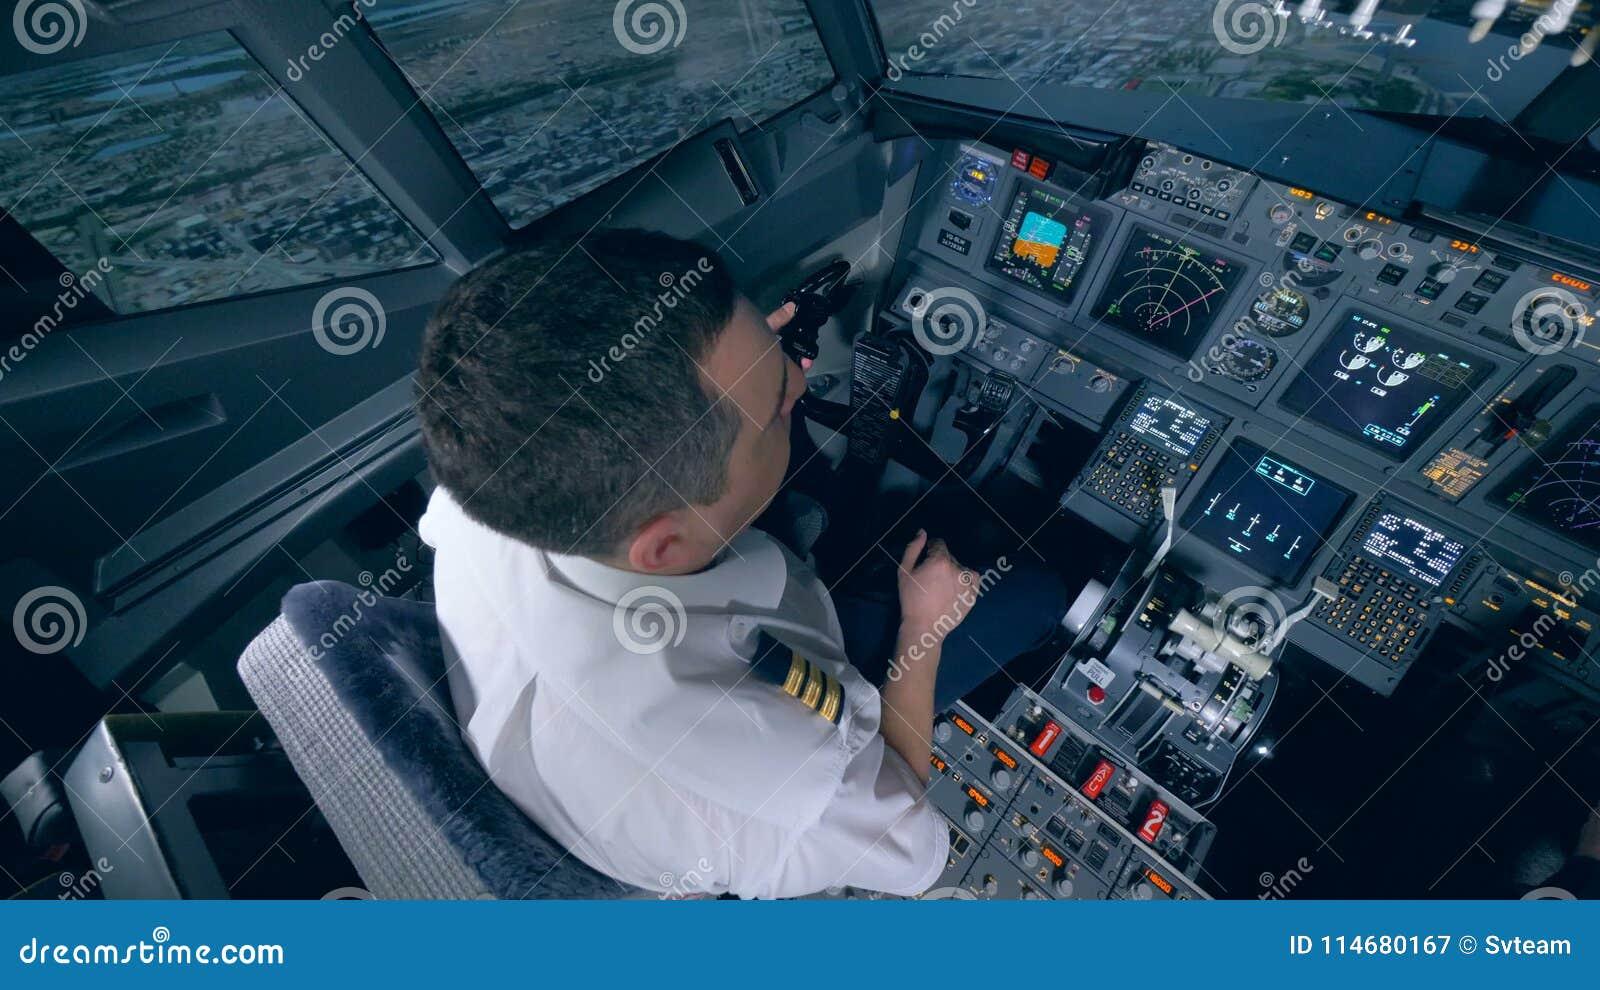 The pilot controls the plane in flight simulator